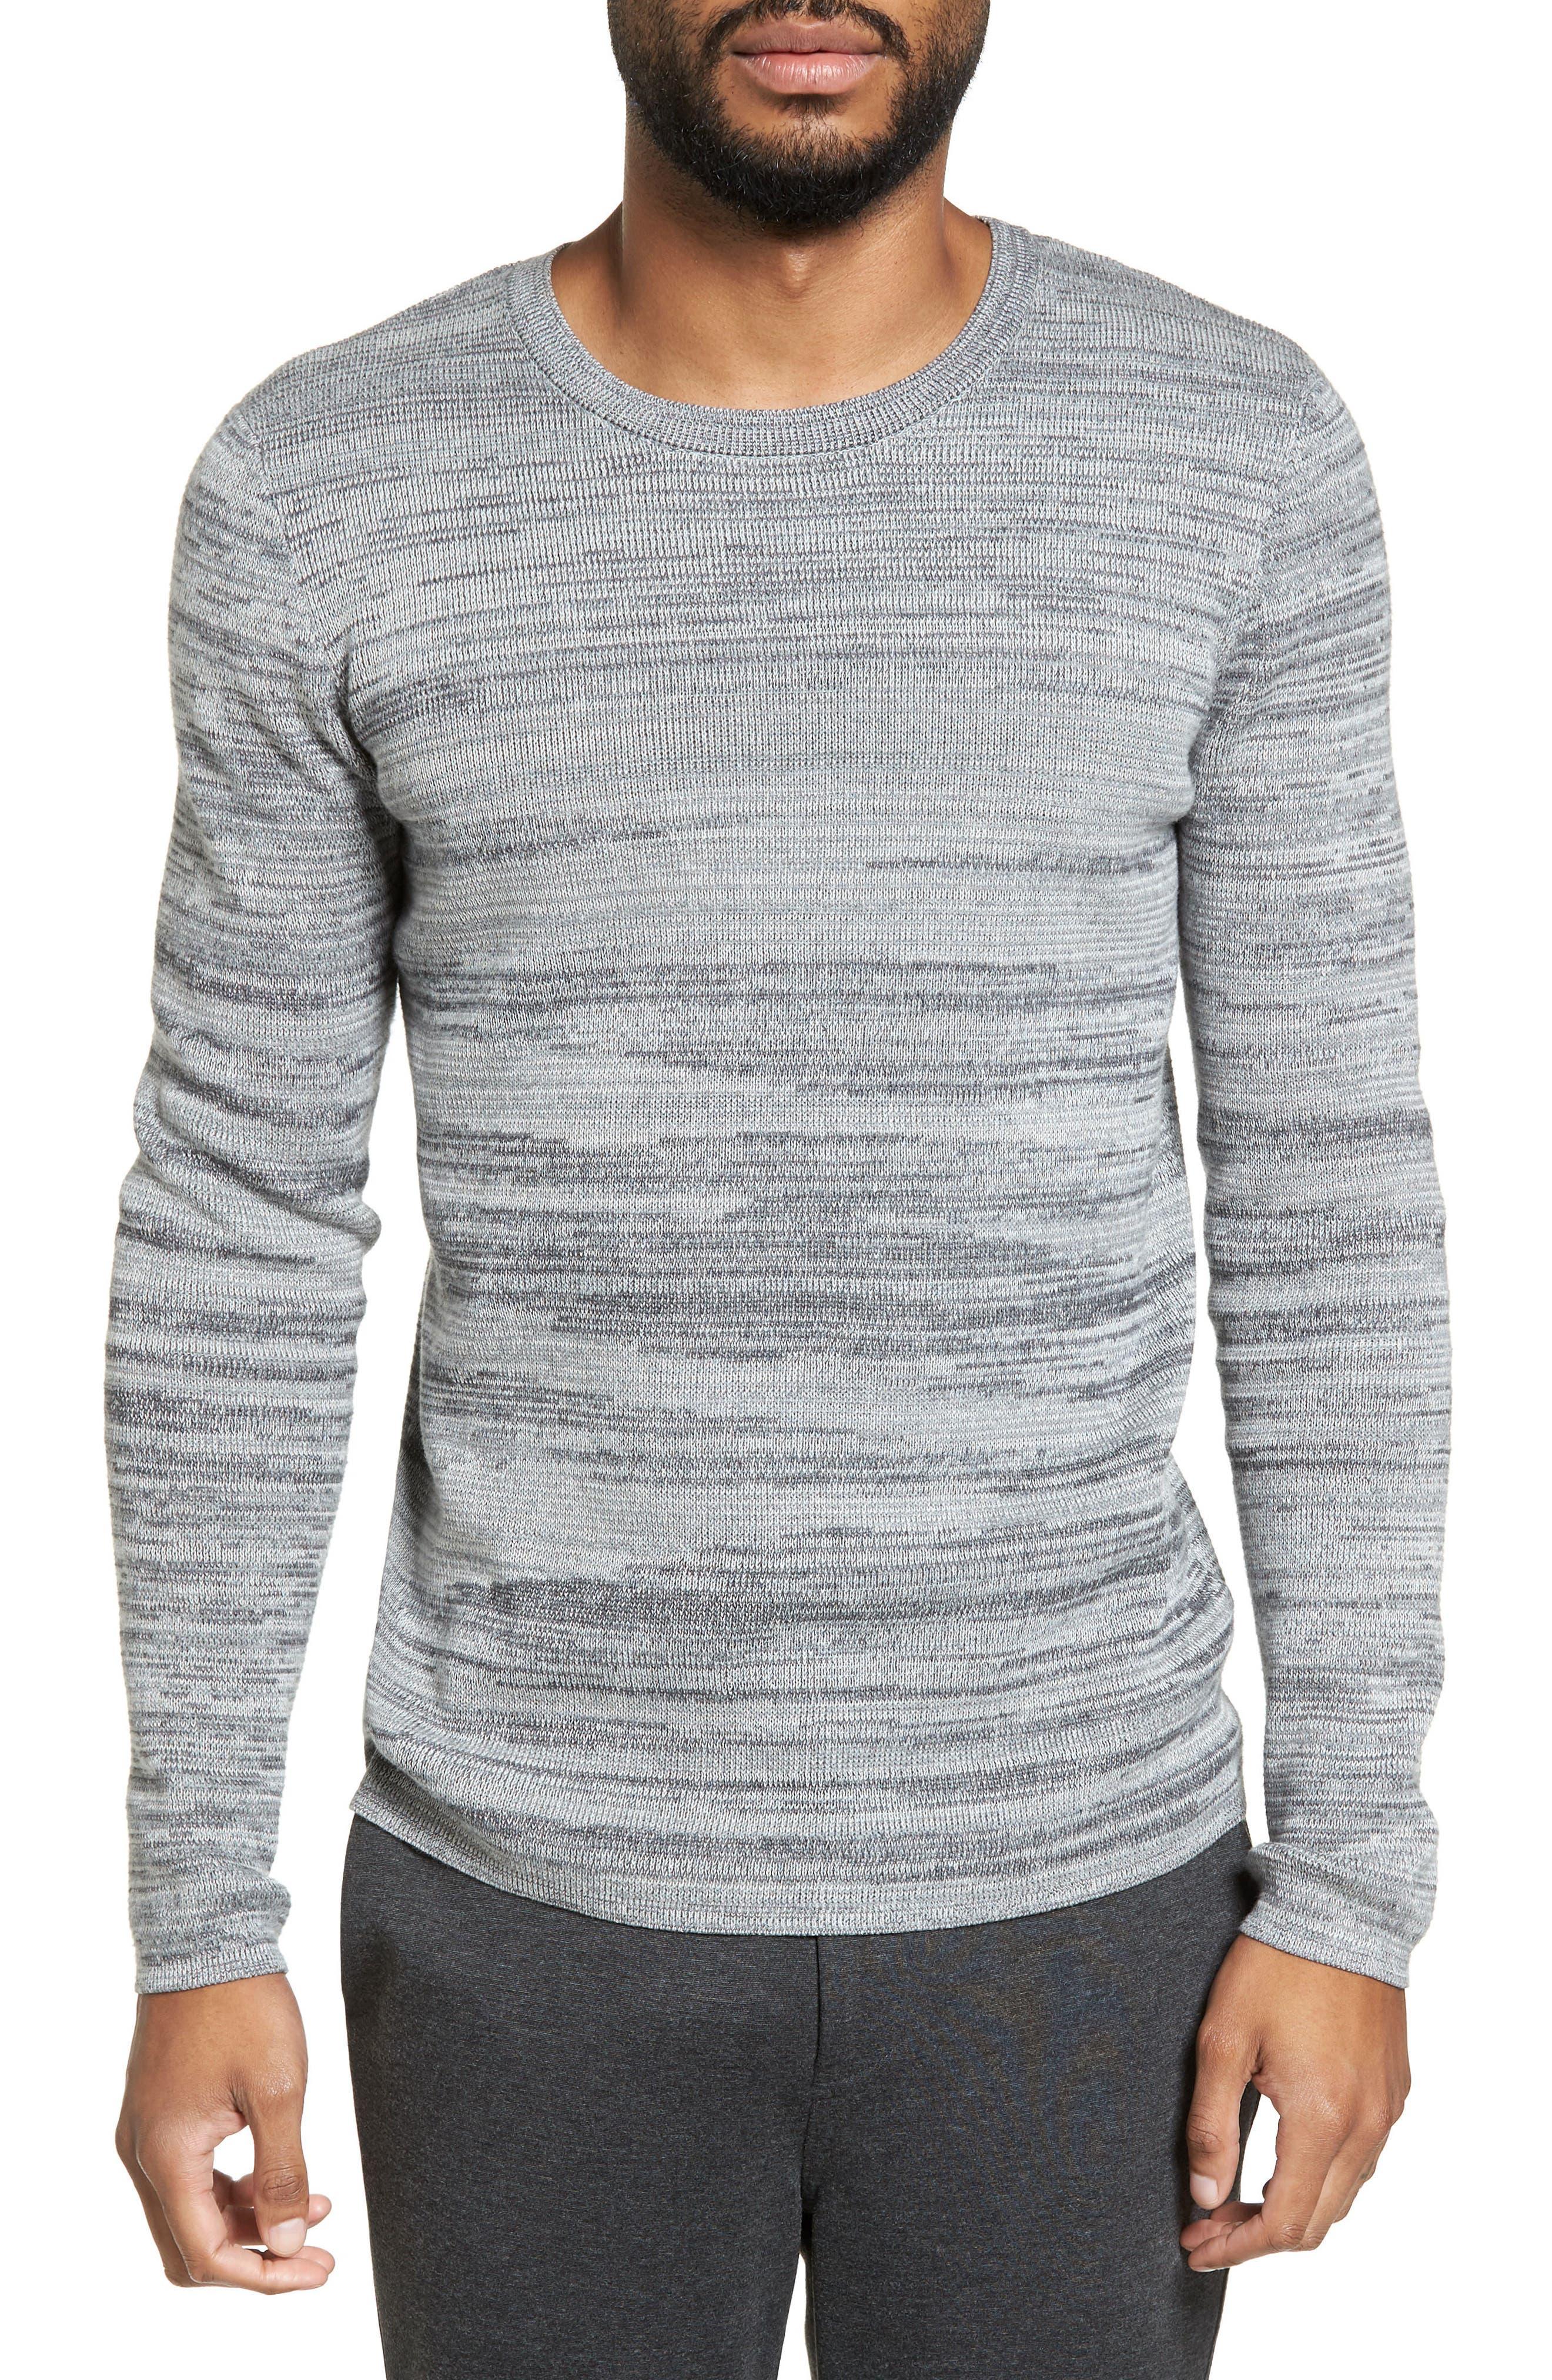 Calibrate Space Dye Crewneck Sweater